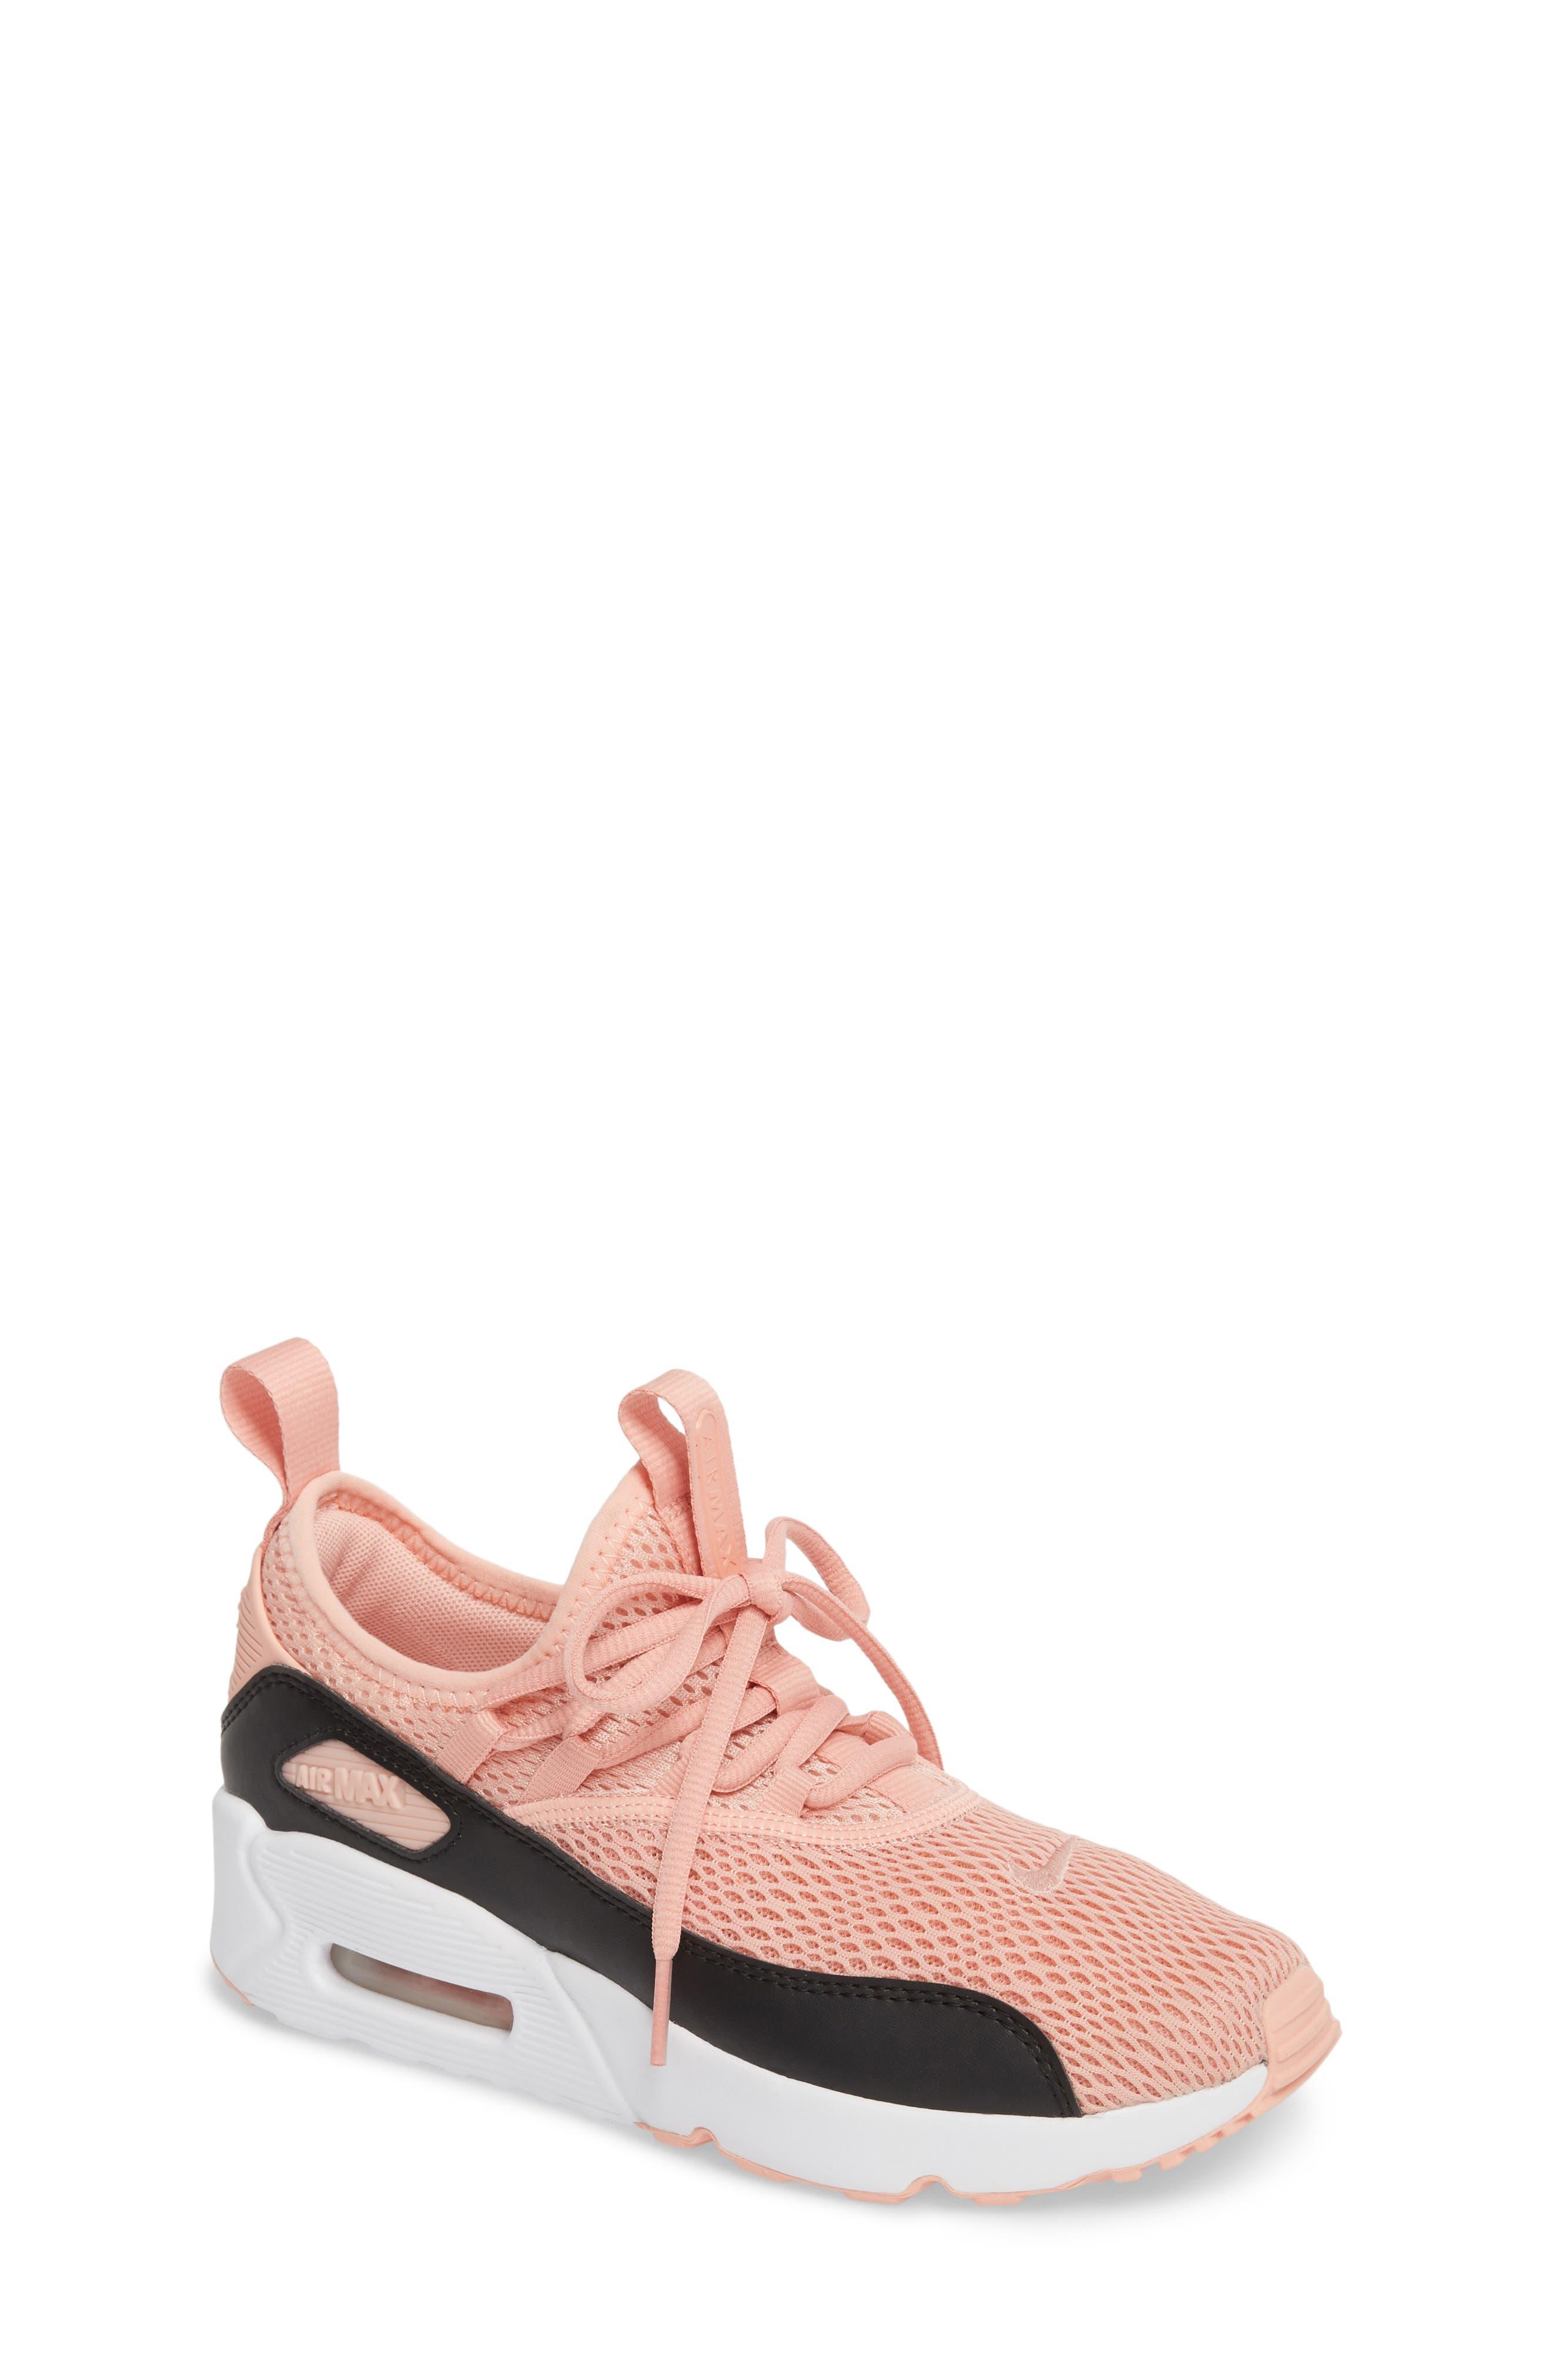 Air Max 90 EZ Sneaker,                         Main,                         color, Coral Stardust/ Black